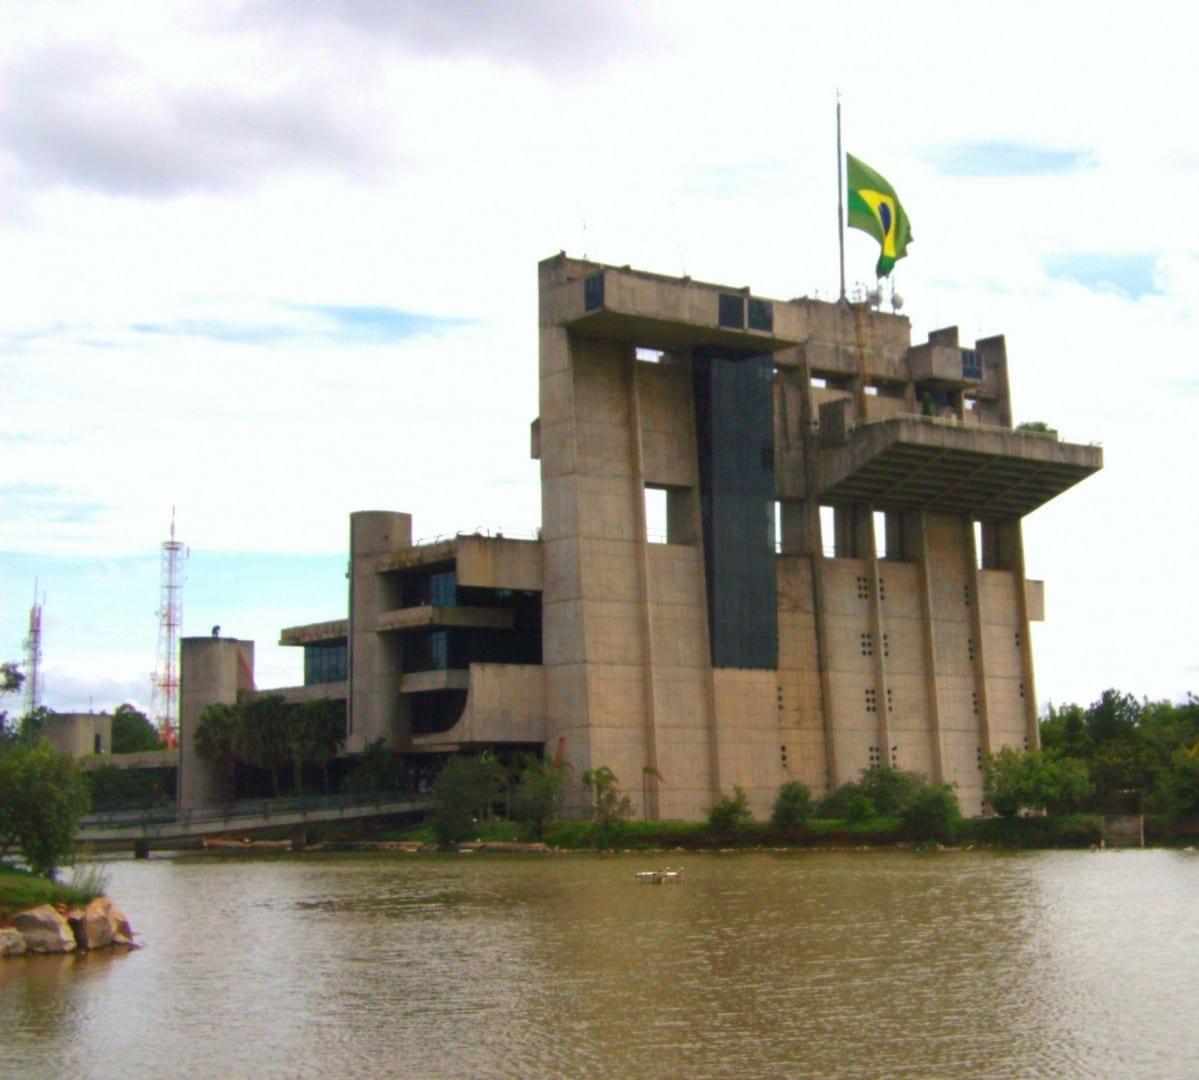 Ayuntamiento de Sorocaba. Sorocaba Brasil